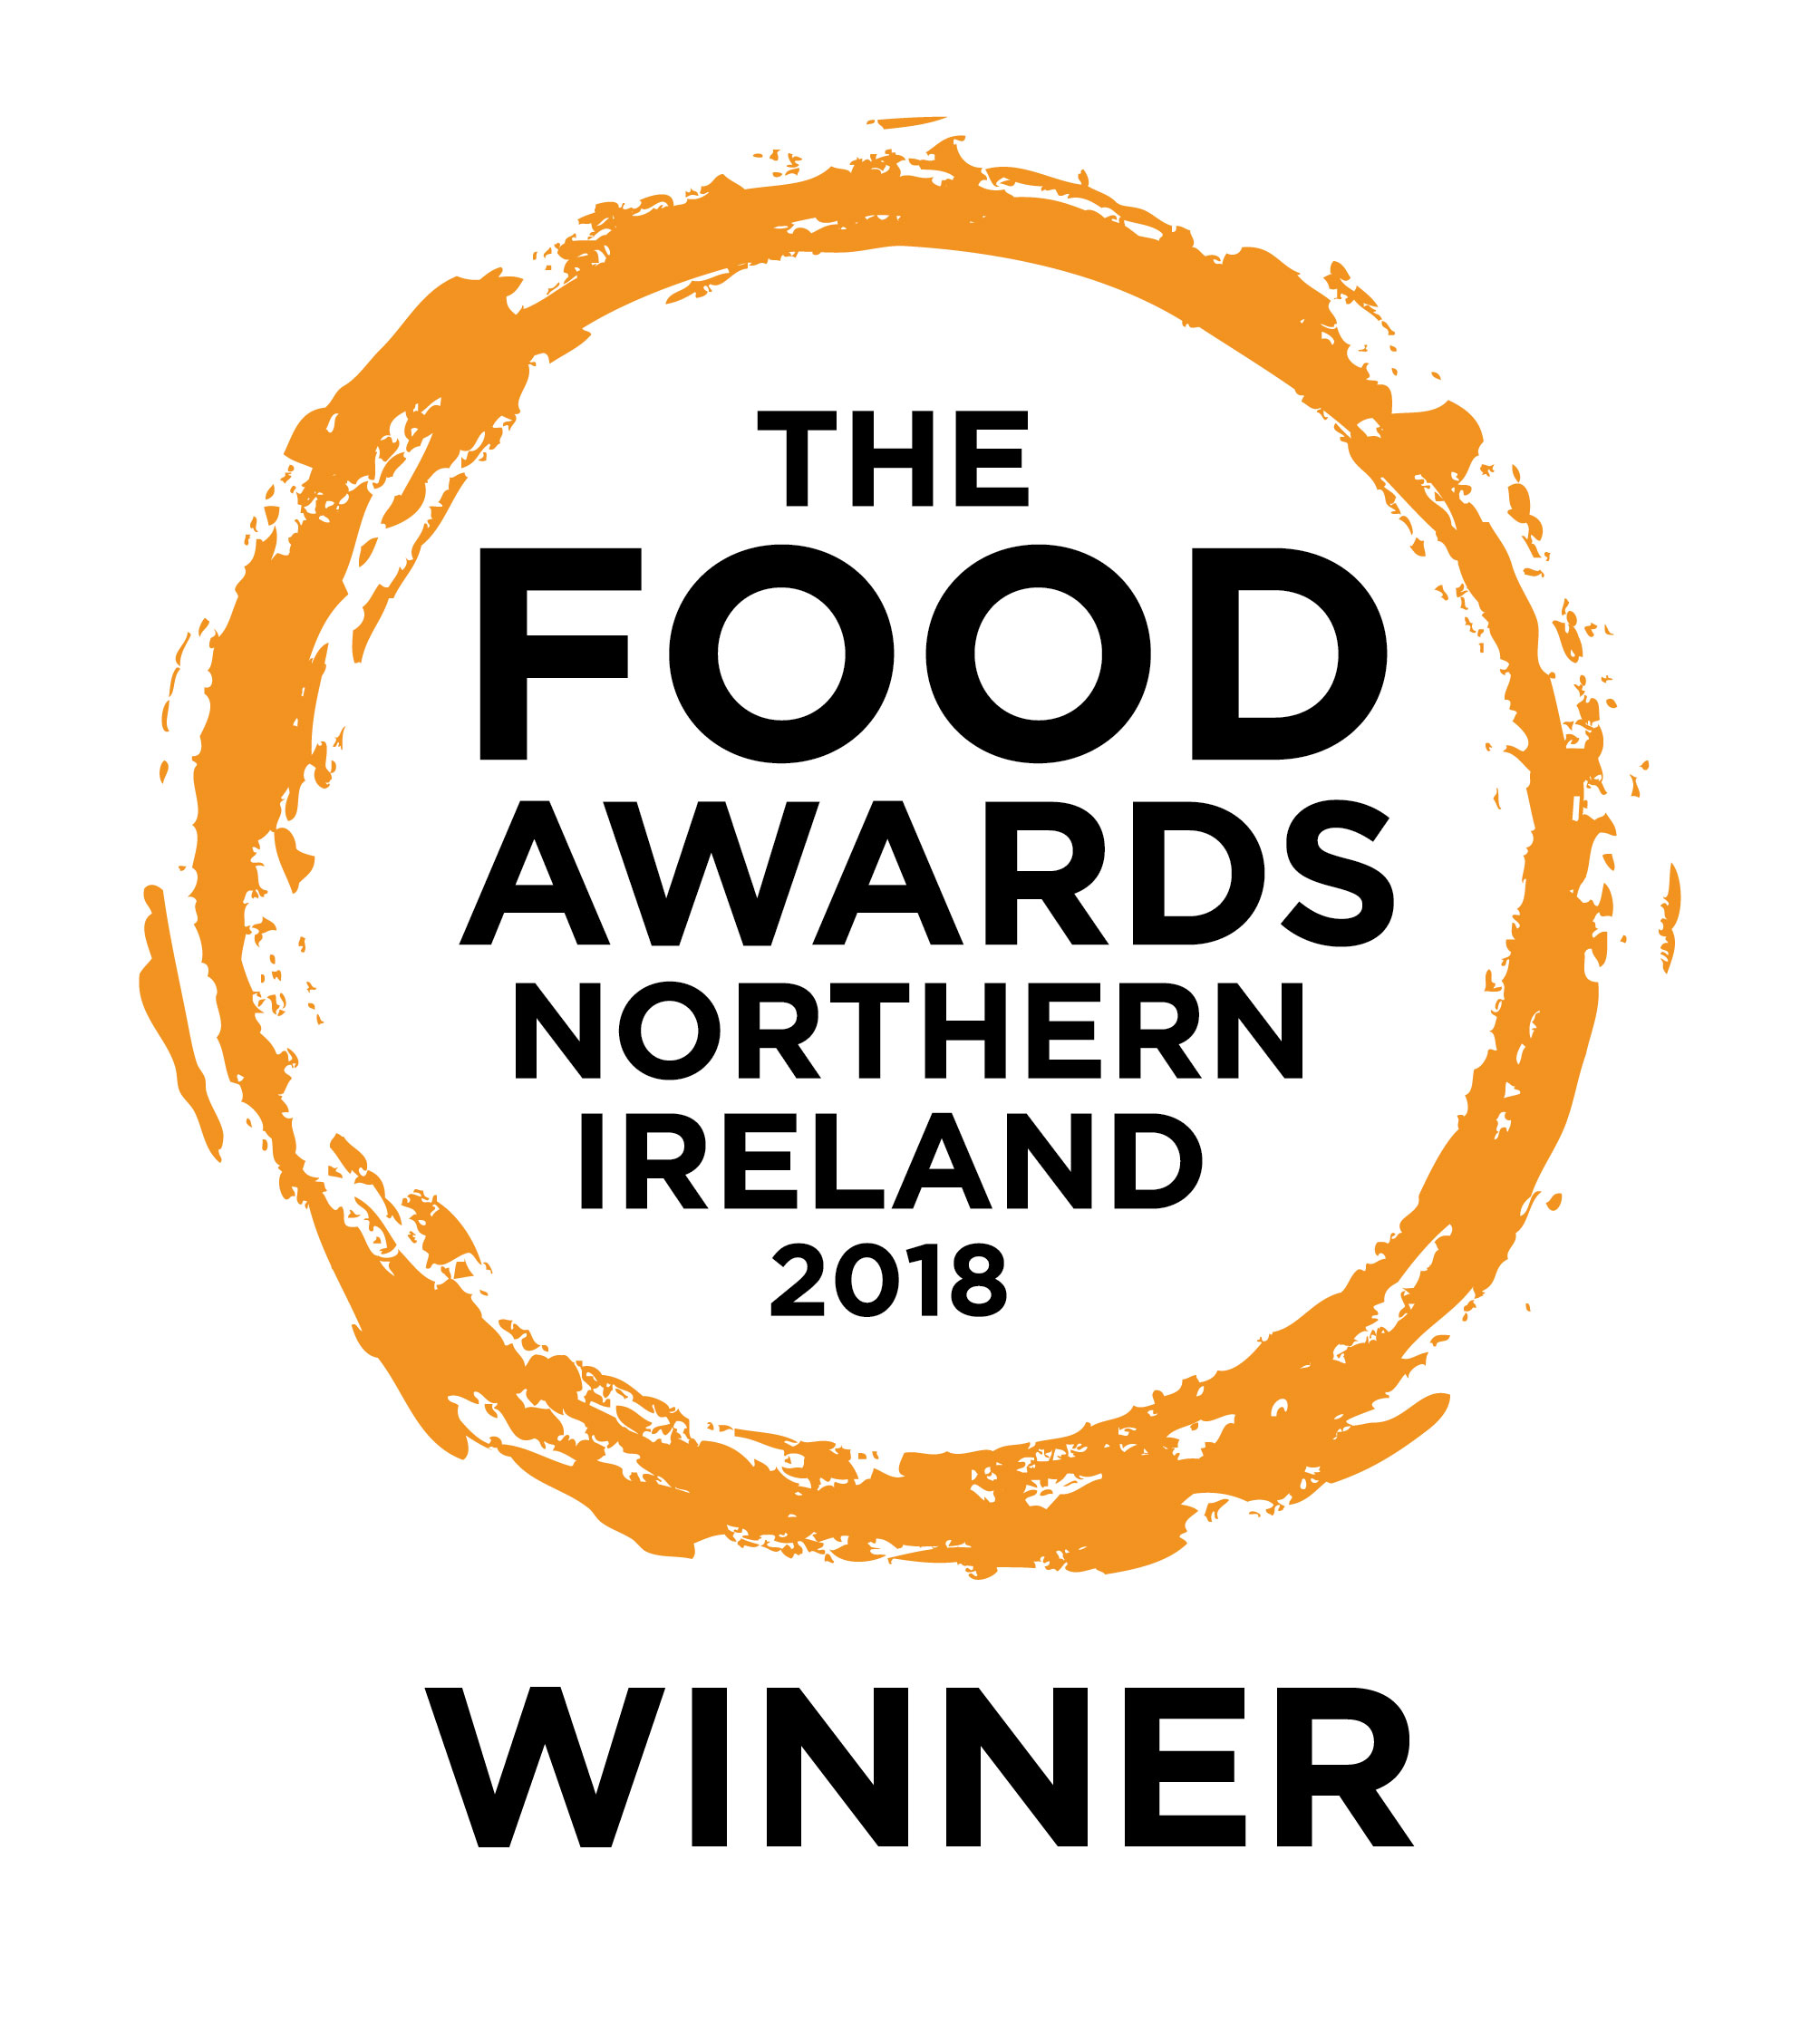 Willowbrook Foods secures gold at Food Awards Northern Ireland